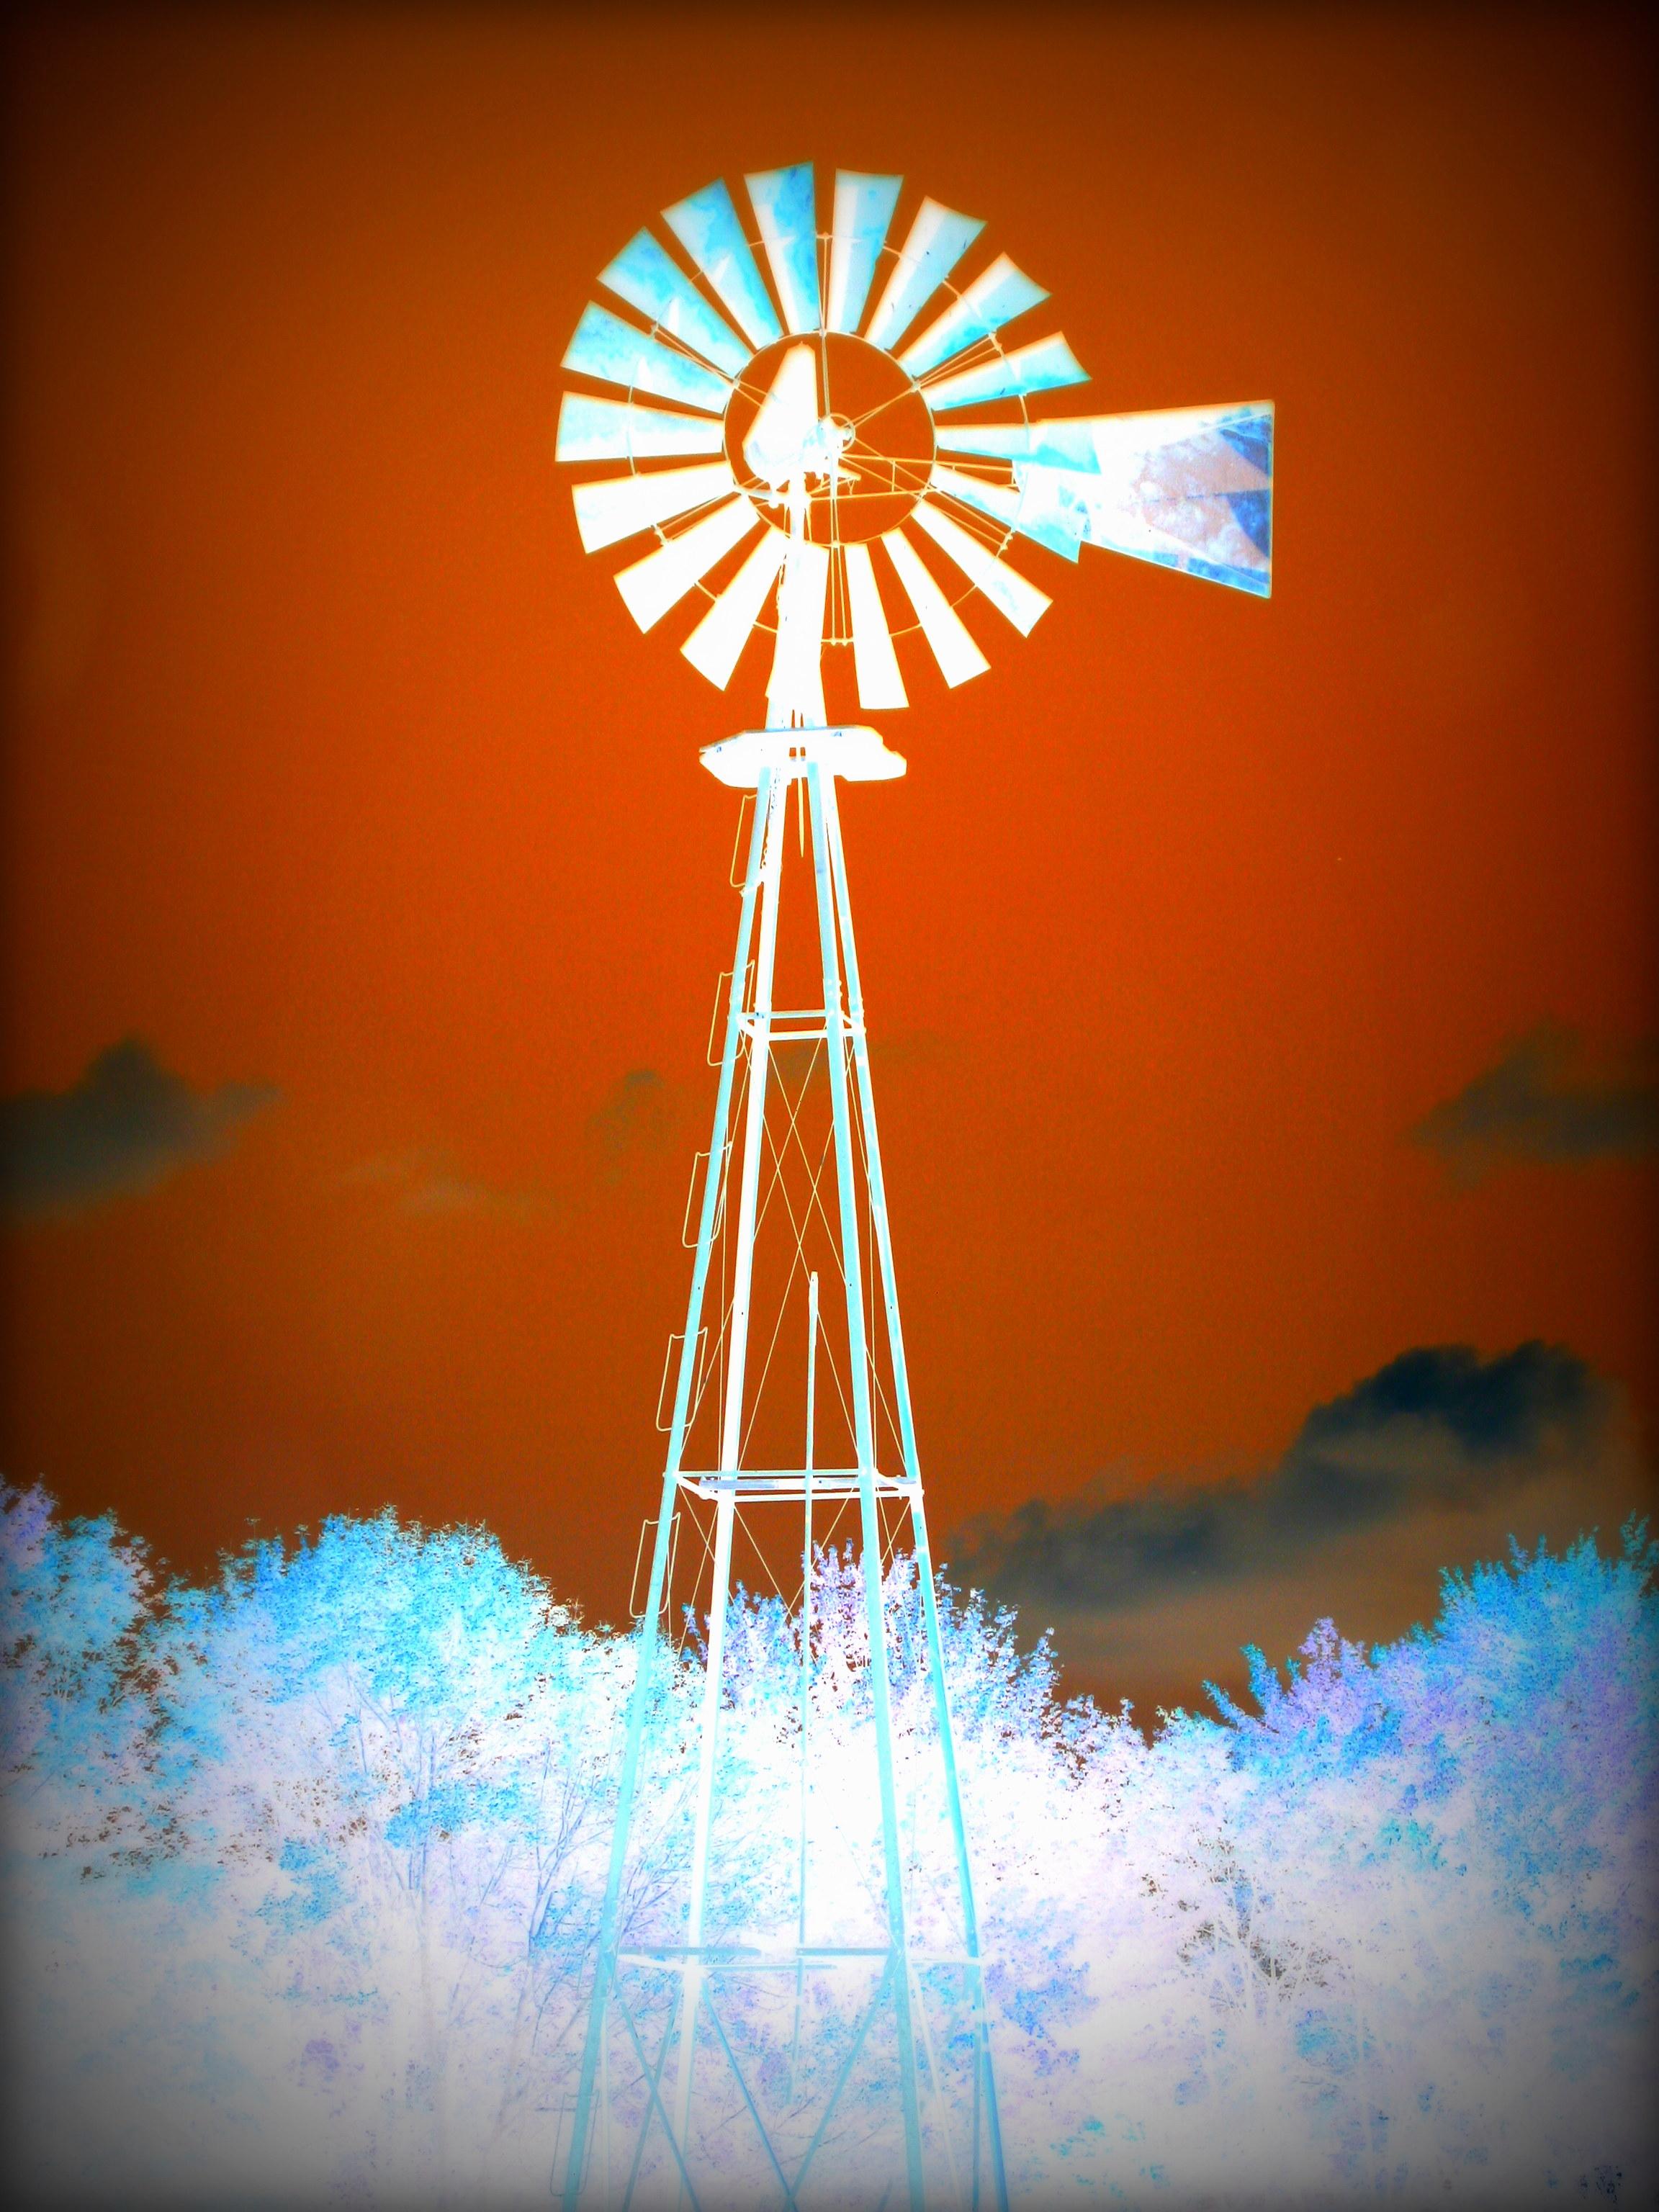 Inverted Windmill